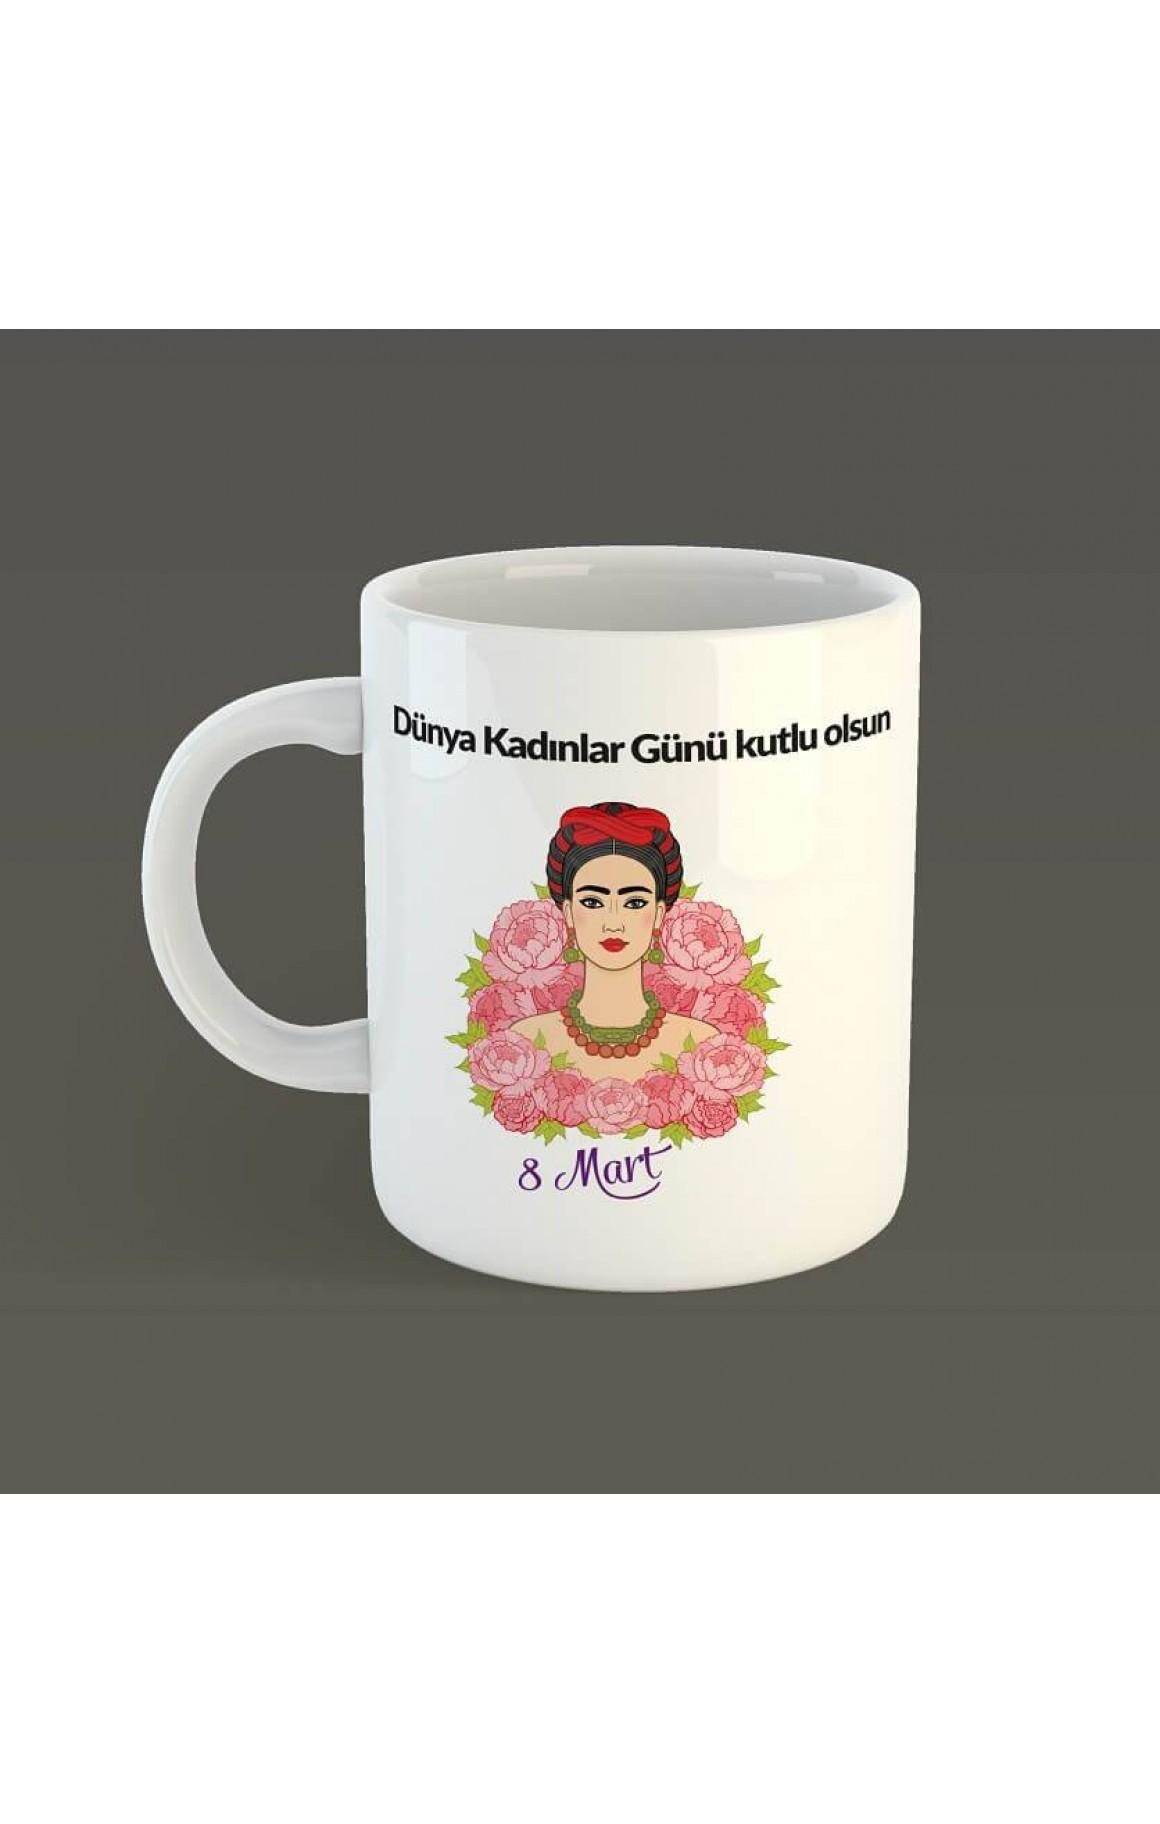 Porselen Kupa - 8 Mart - Frida